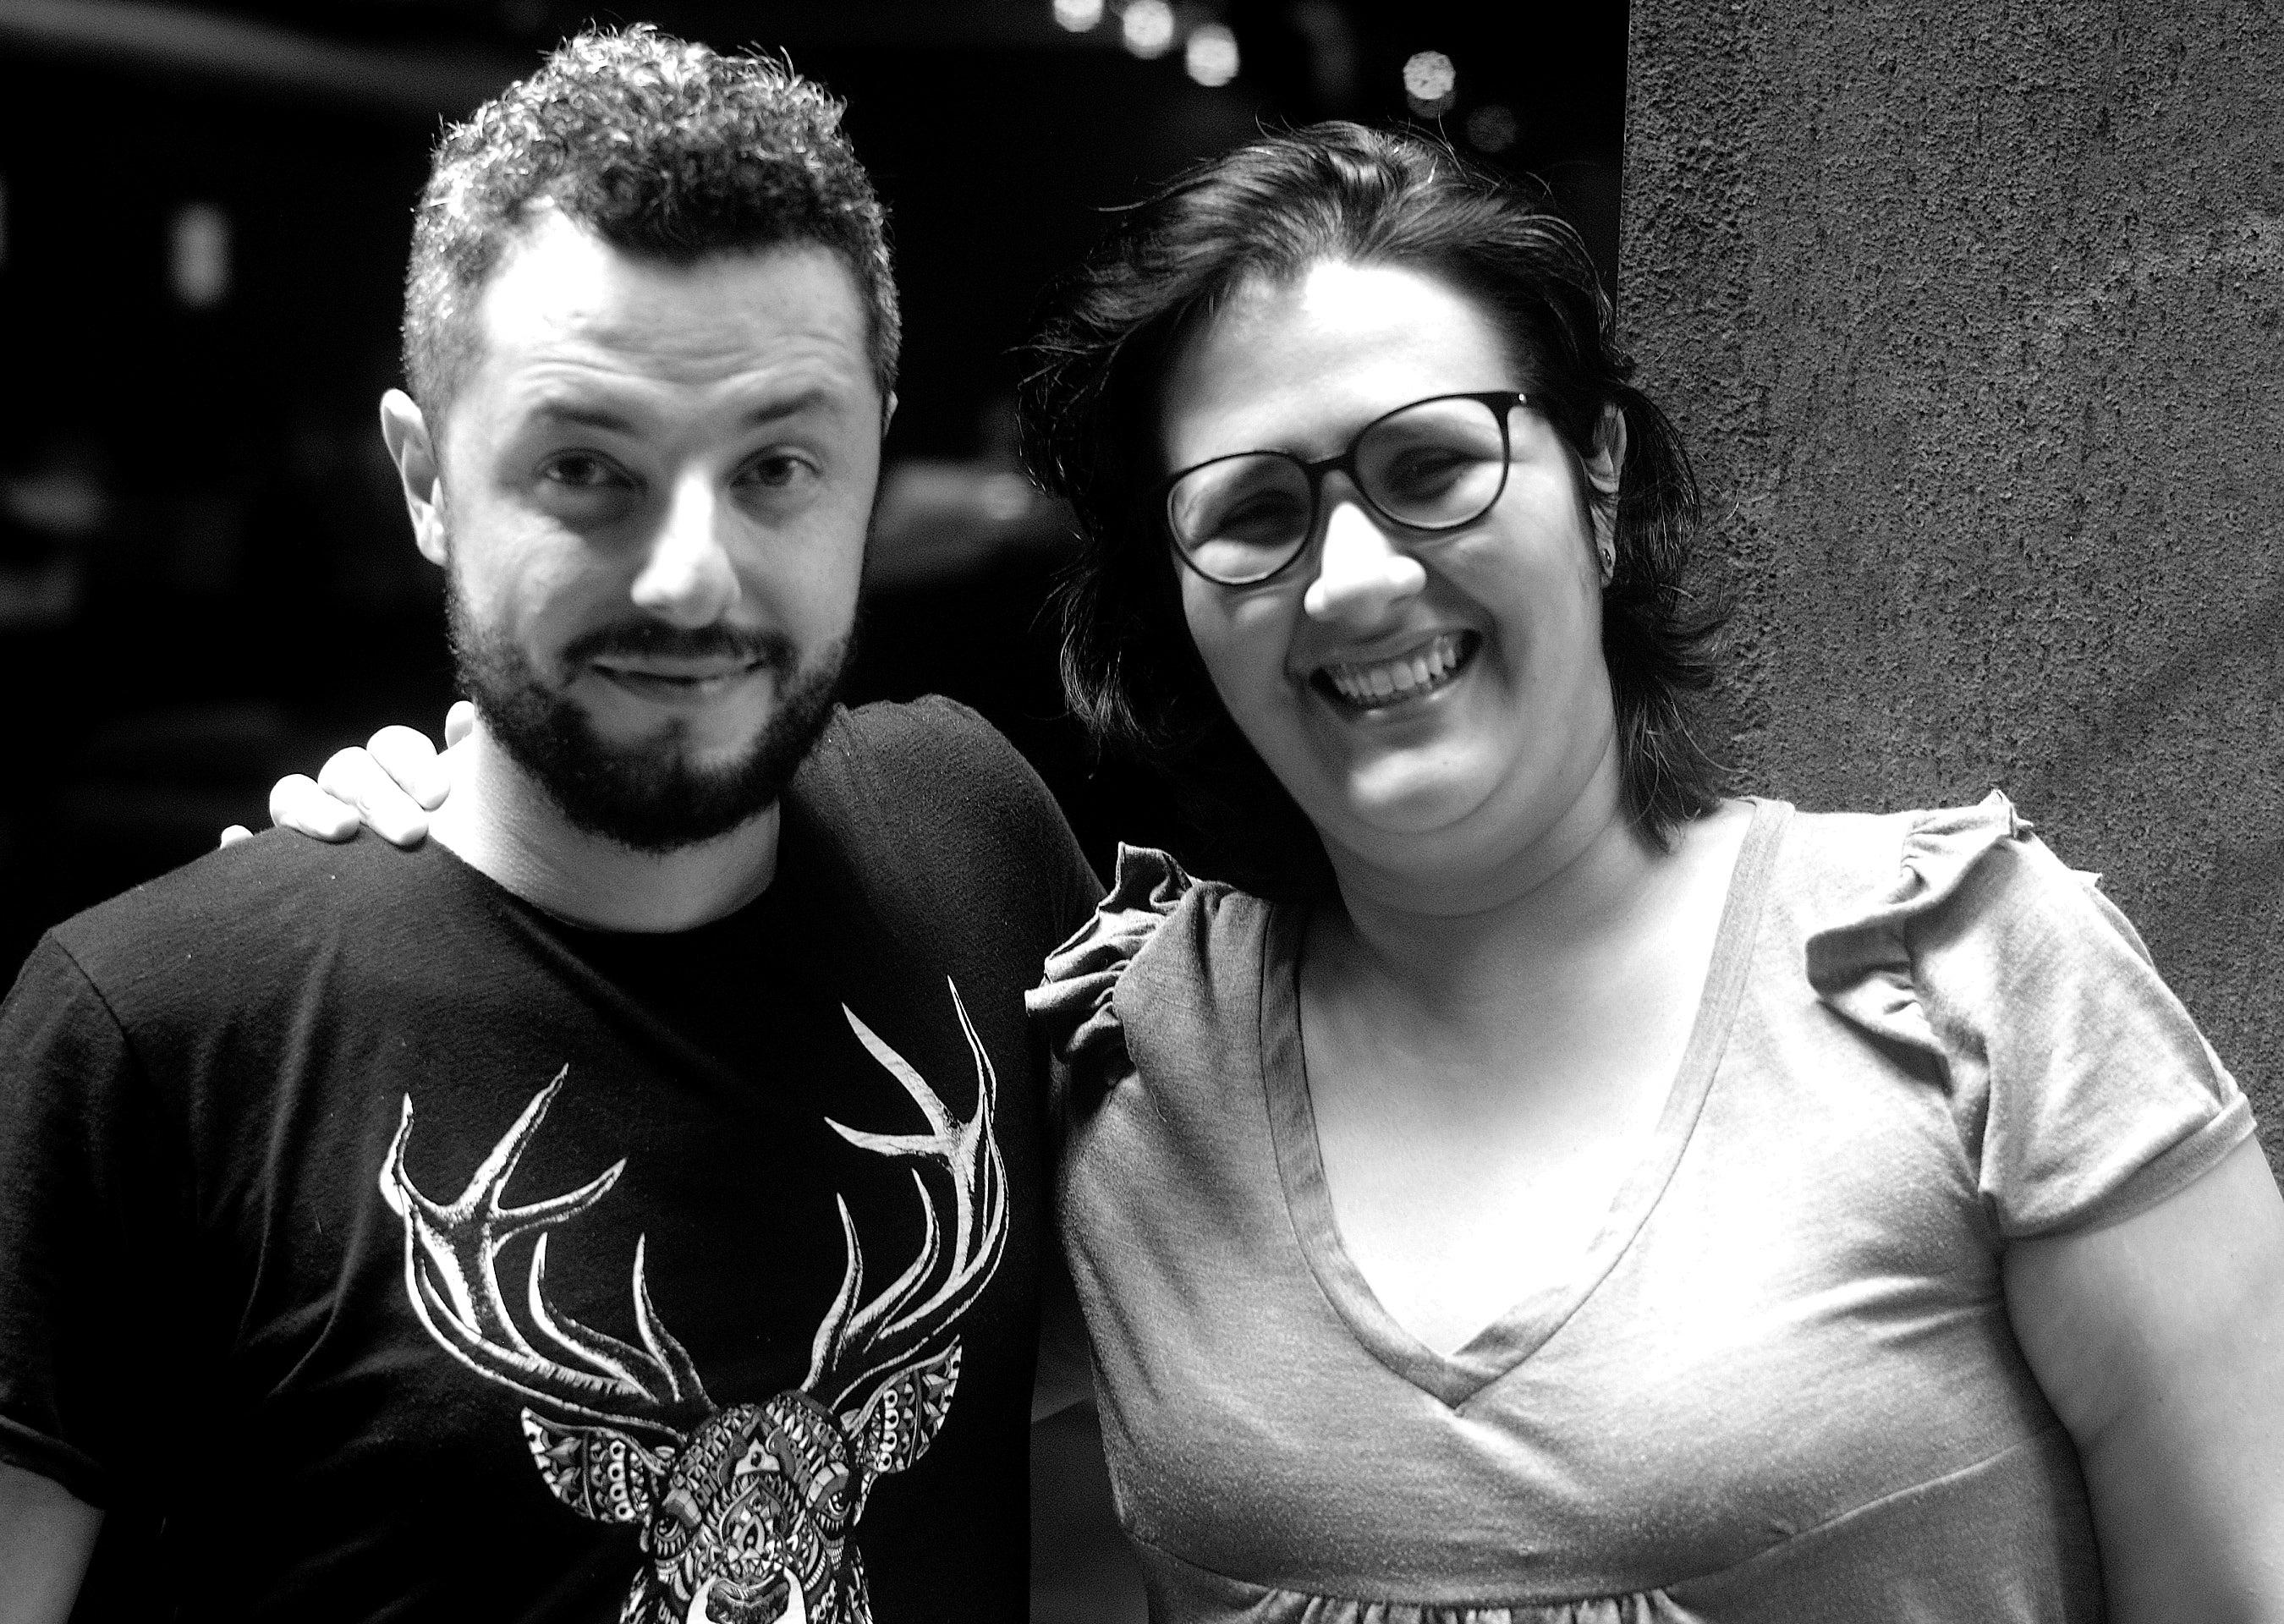 Brazilian filmmakers Juliana Rojas and Marco Dutra